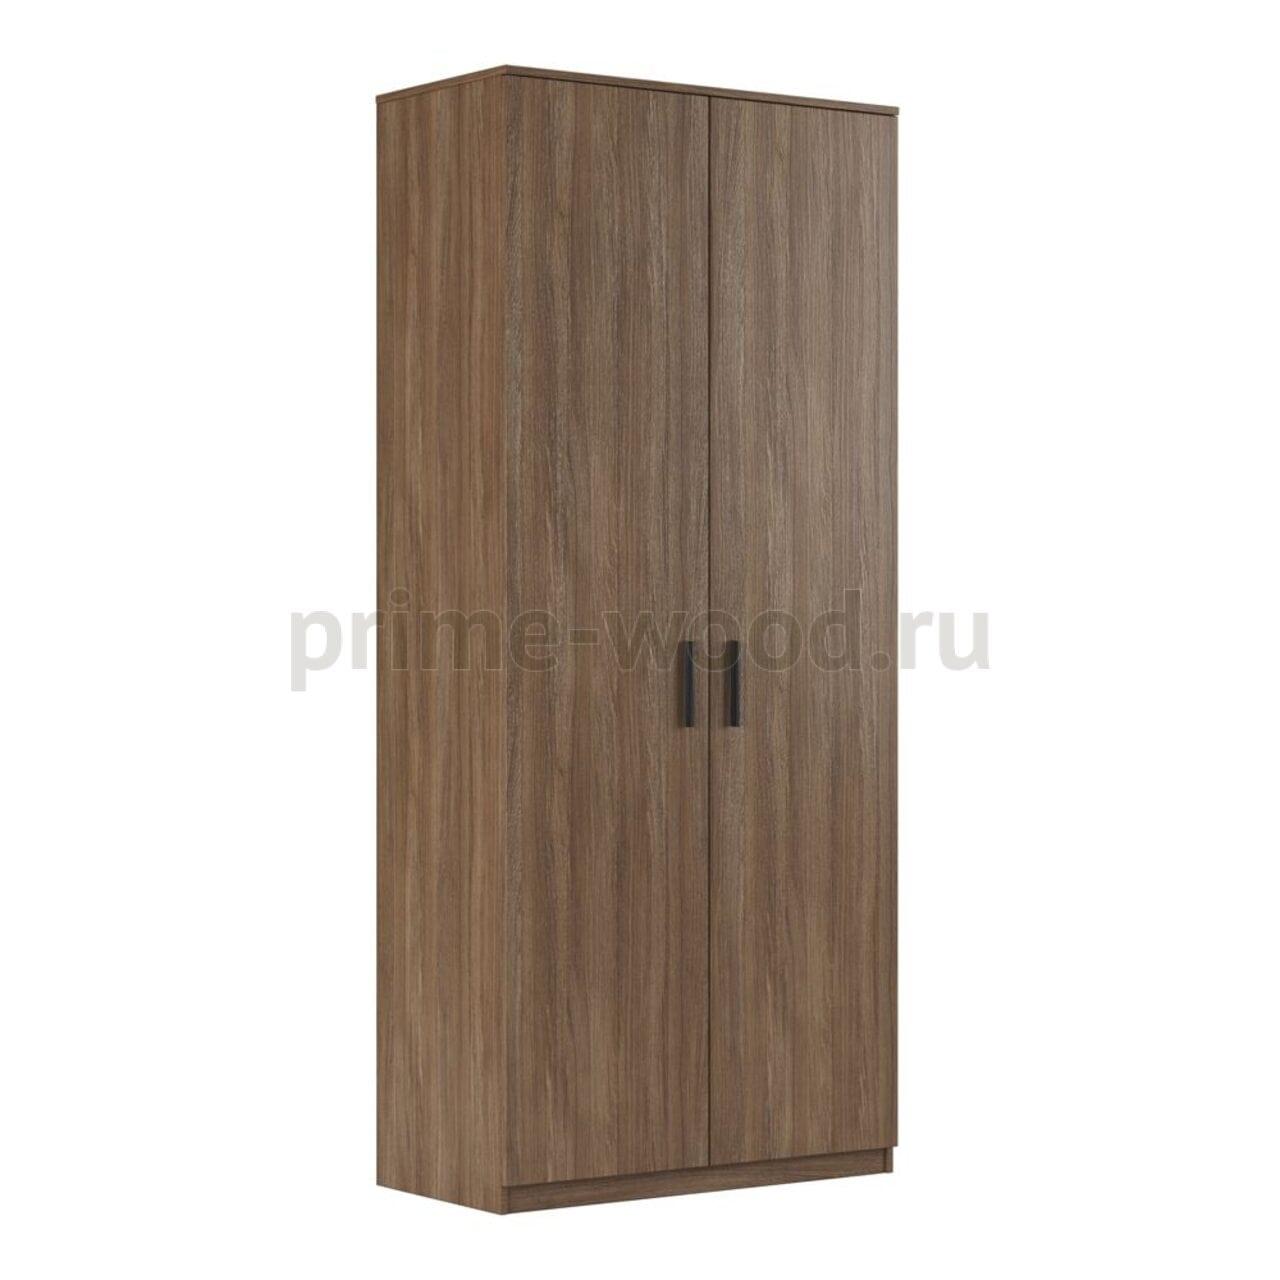 Шкаф для бумаг глухой, древесный  ASTI 90x45x205 - фото 3